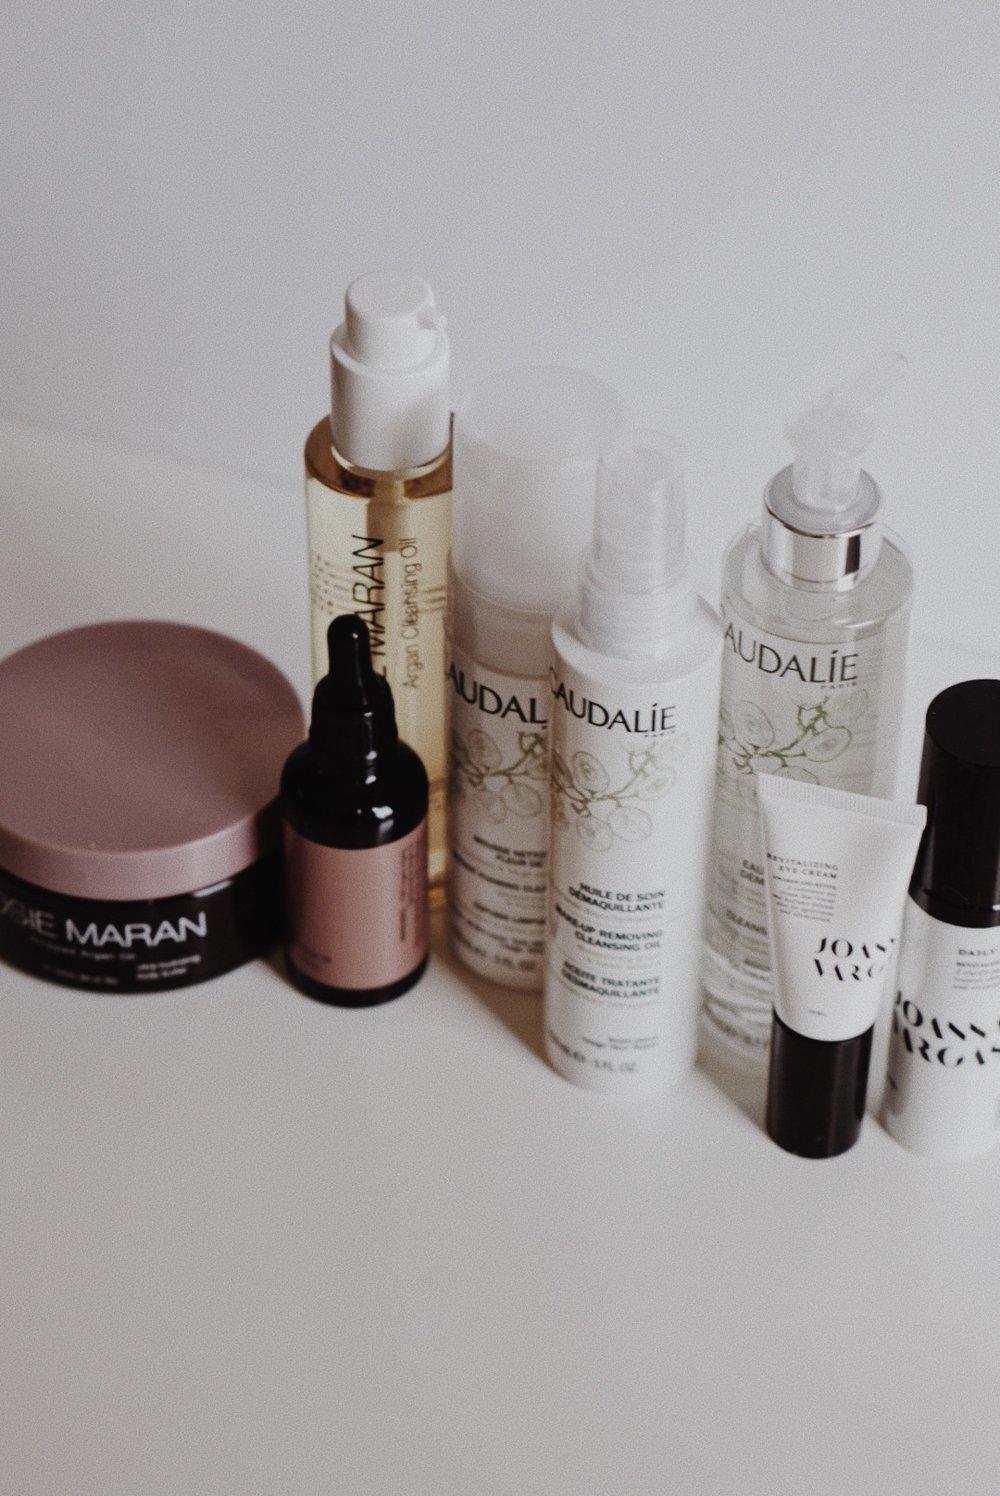 Skincare PR Haul Josie Maran, Caudalie, Joanna Vargas, ClarityRX